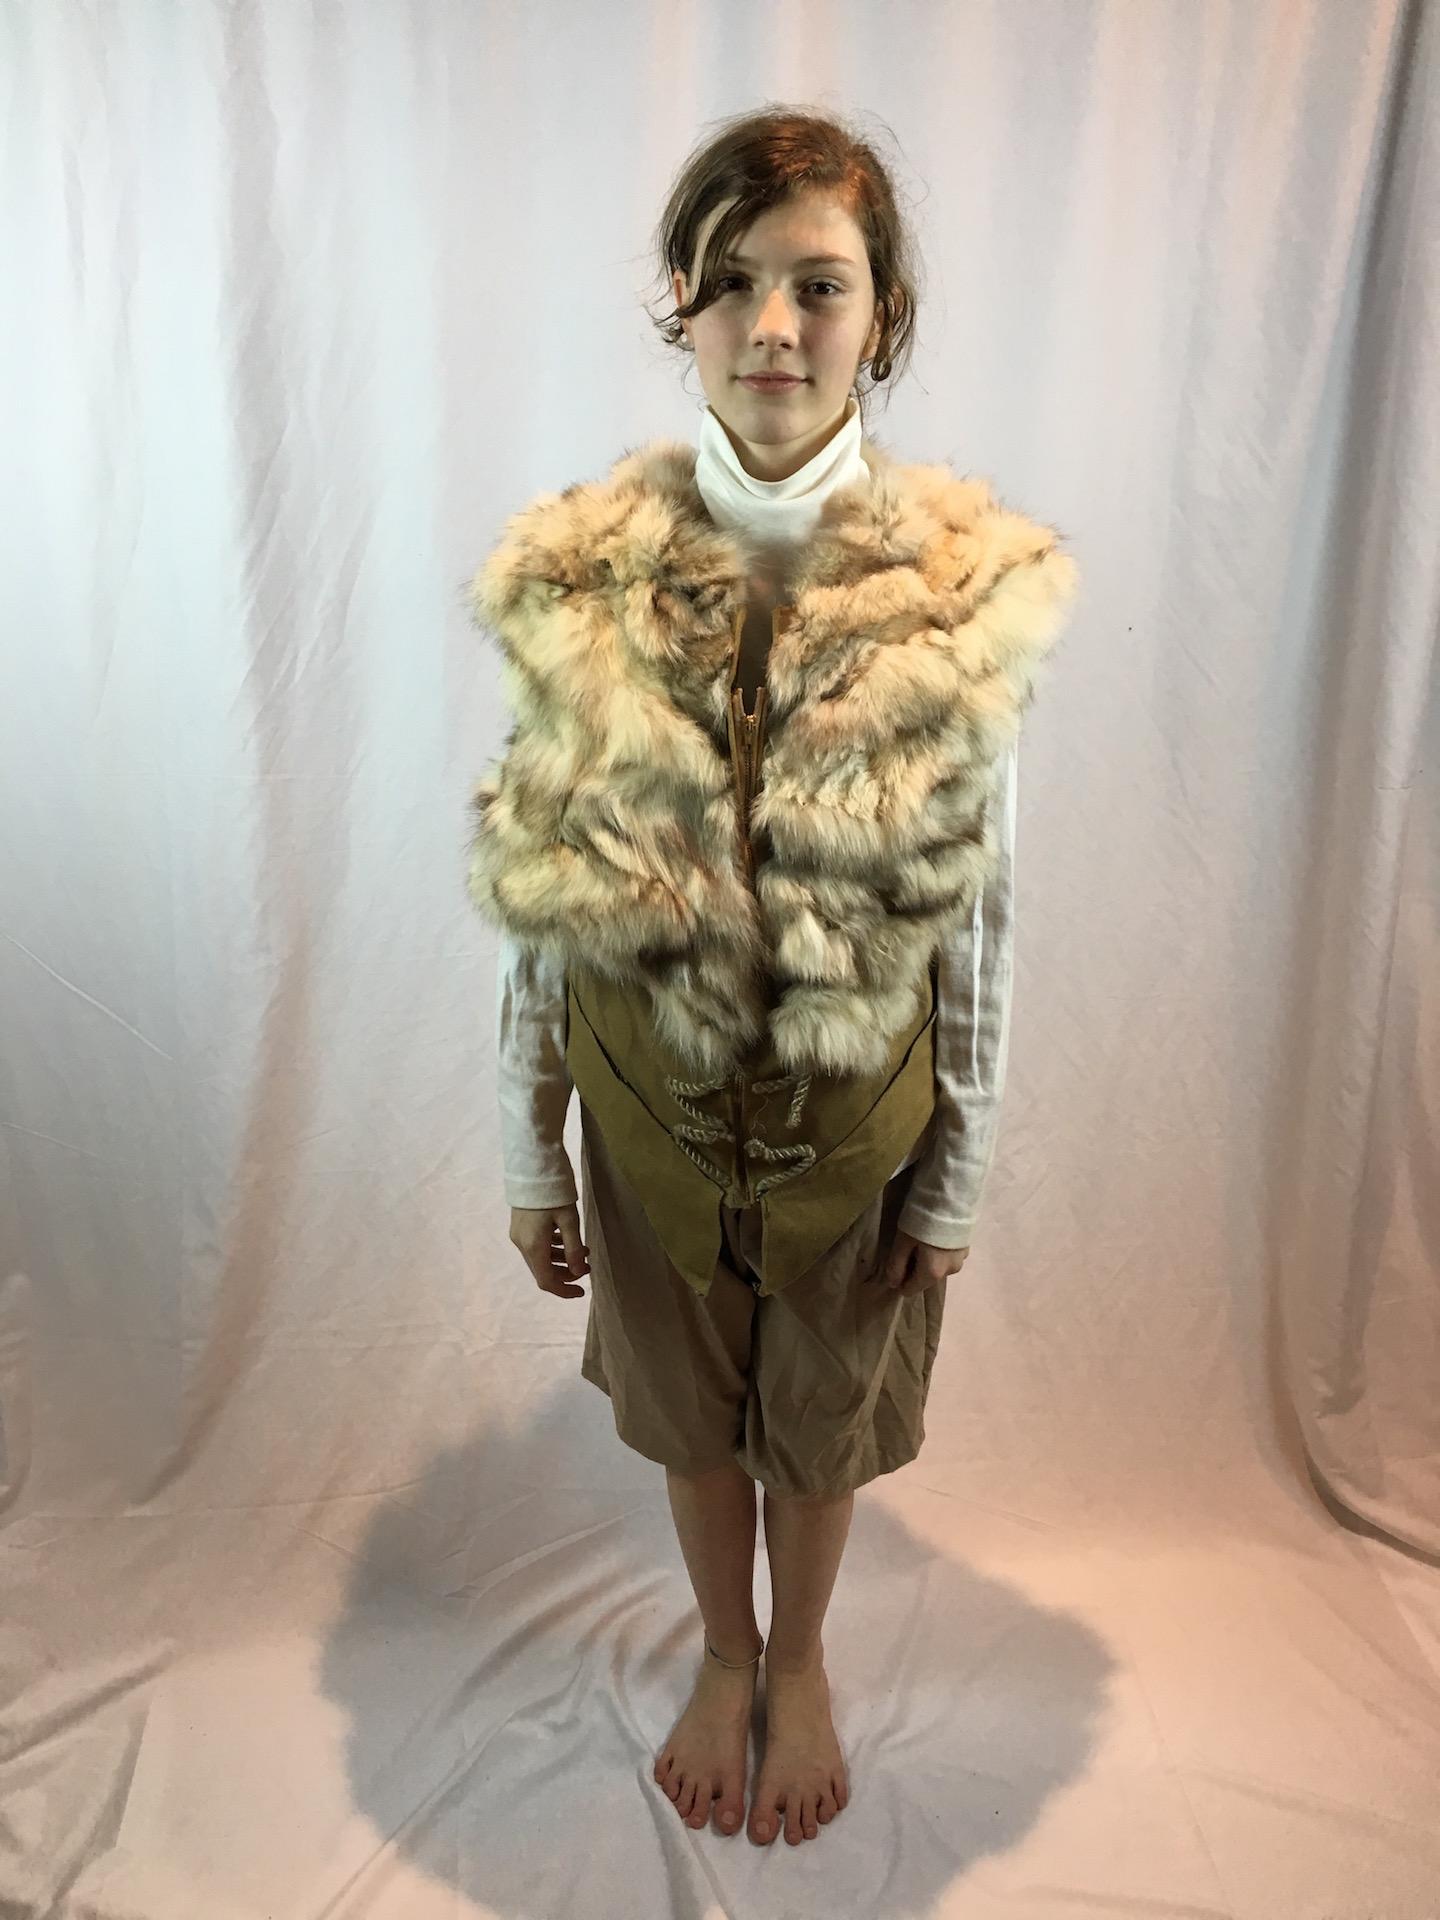 Narnia, LWW Father Christmas Sleigh Reindeer